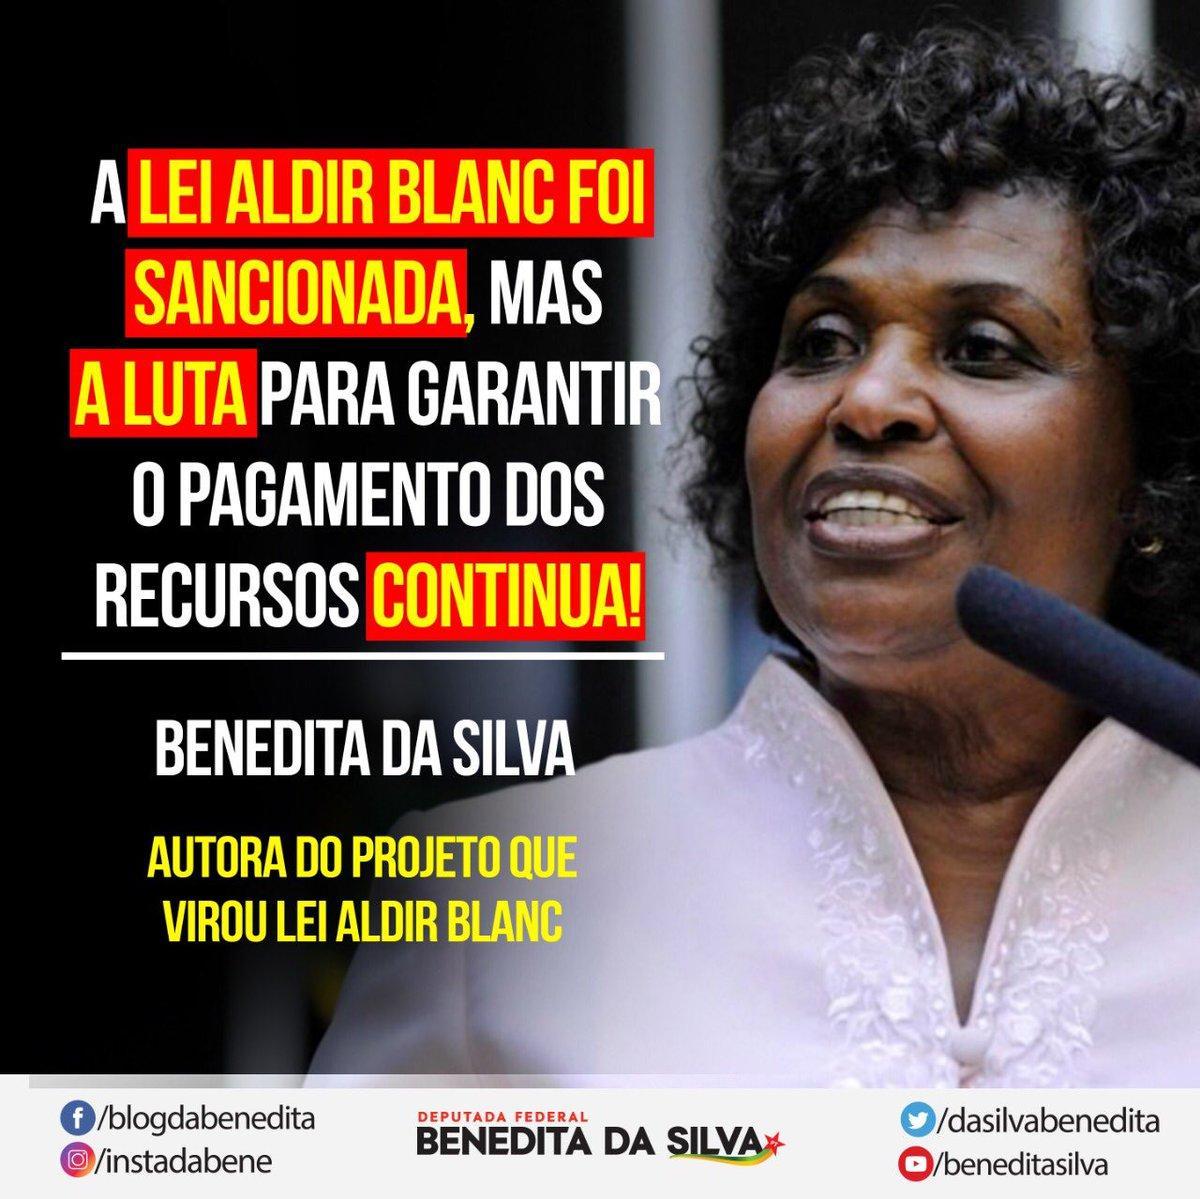 BOA NOTÍCIA! 🔴 A LEI ALDIR BLANC foi SANCIONADA! #leialdirblanc #leialdirblancsancionada